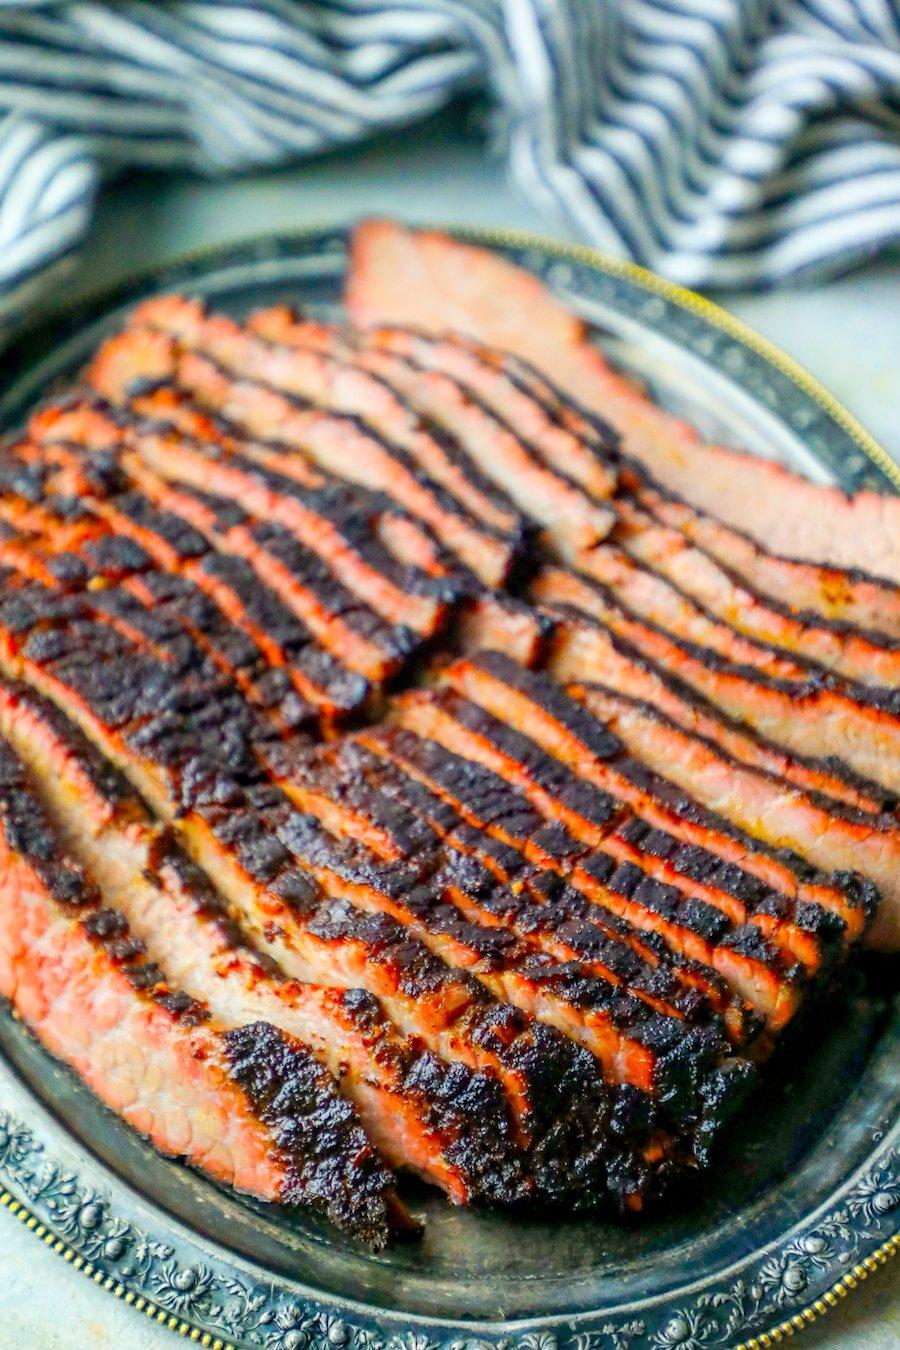 The Best Easy Smoked Brisket Recipe - Sweet Cs Designs